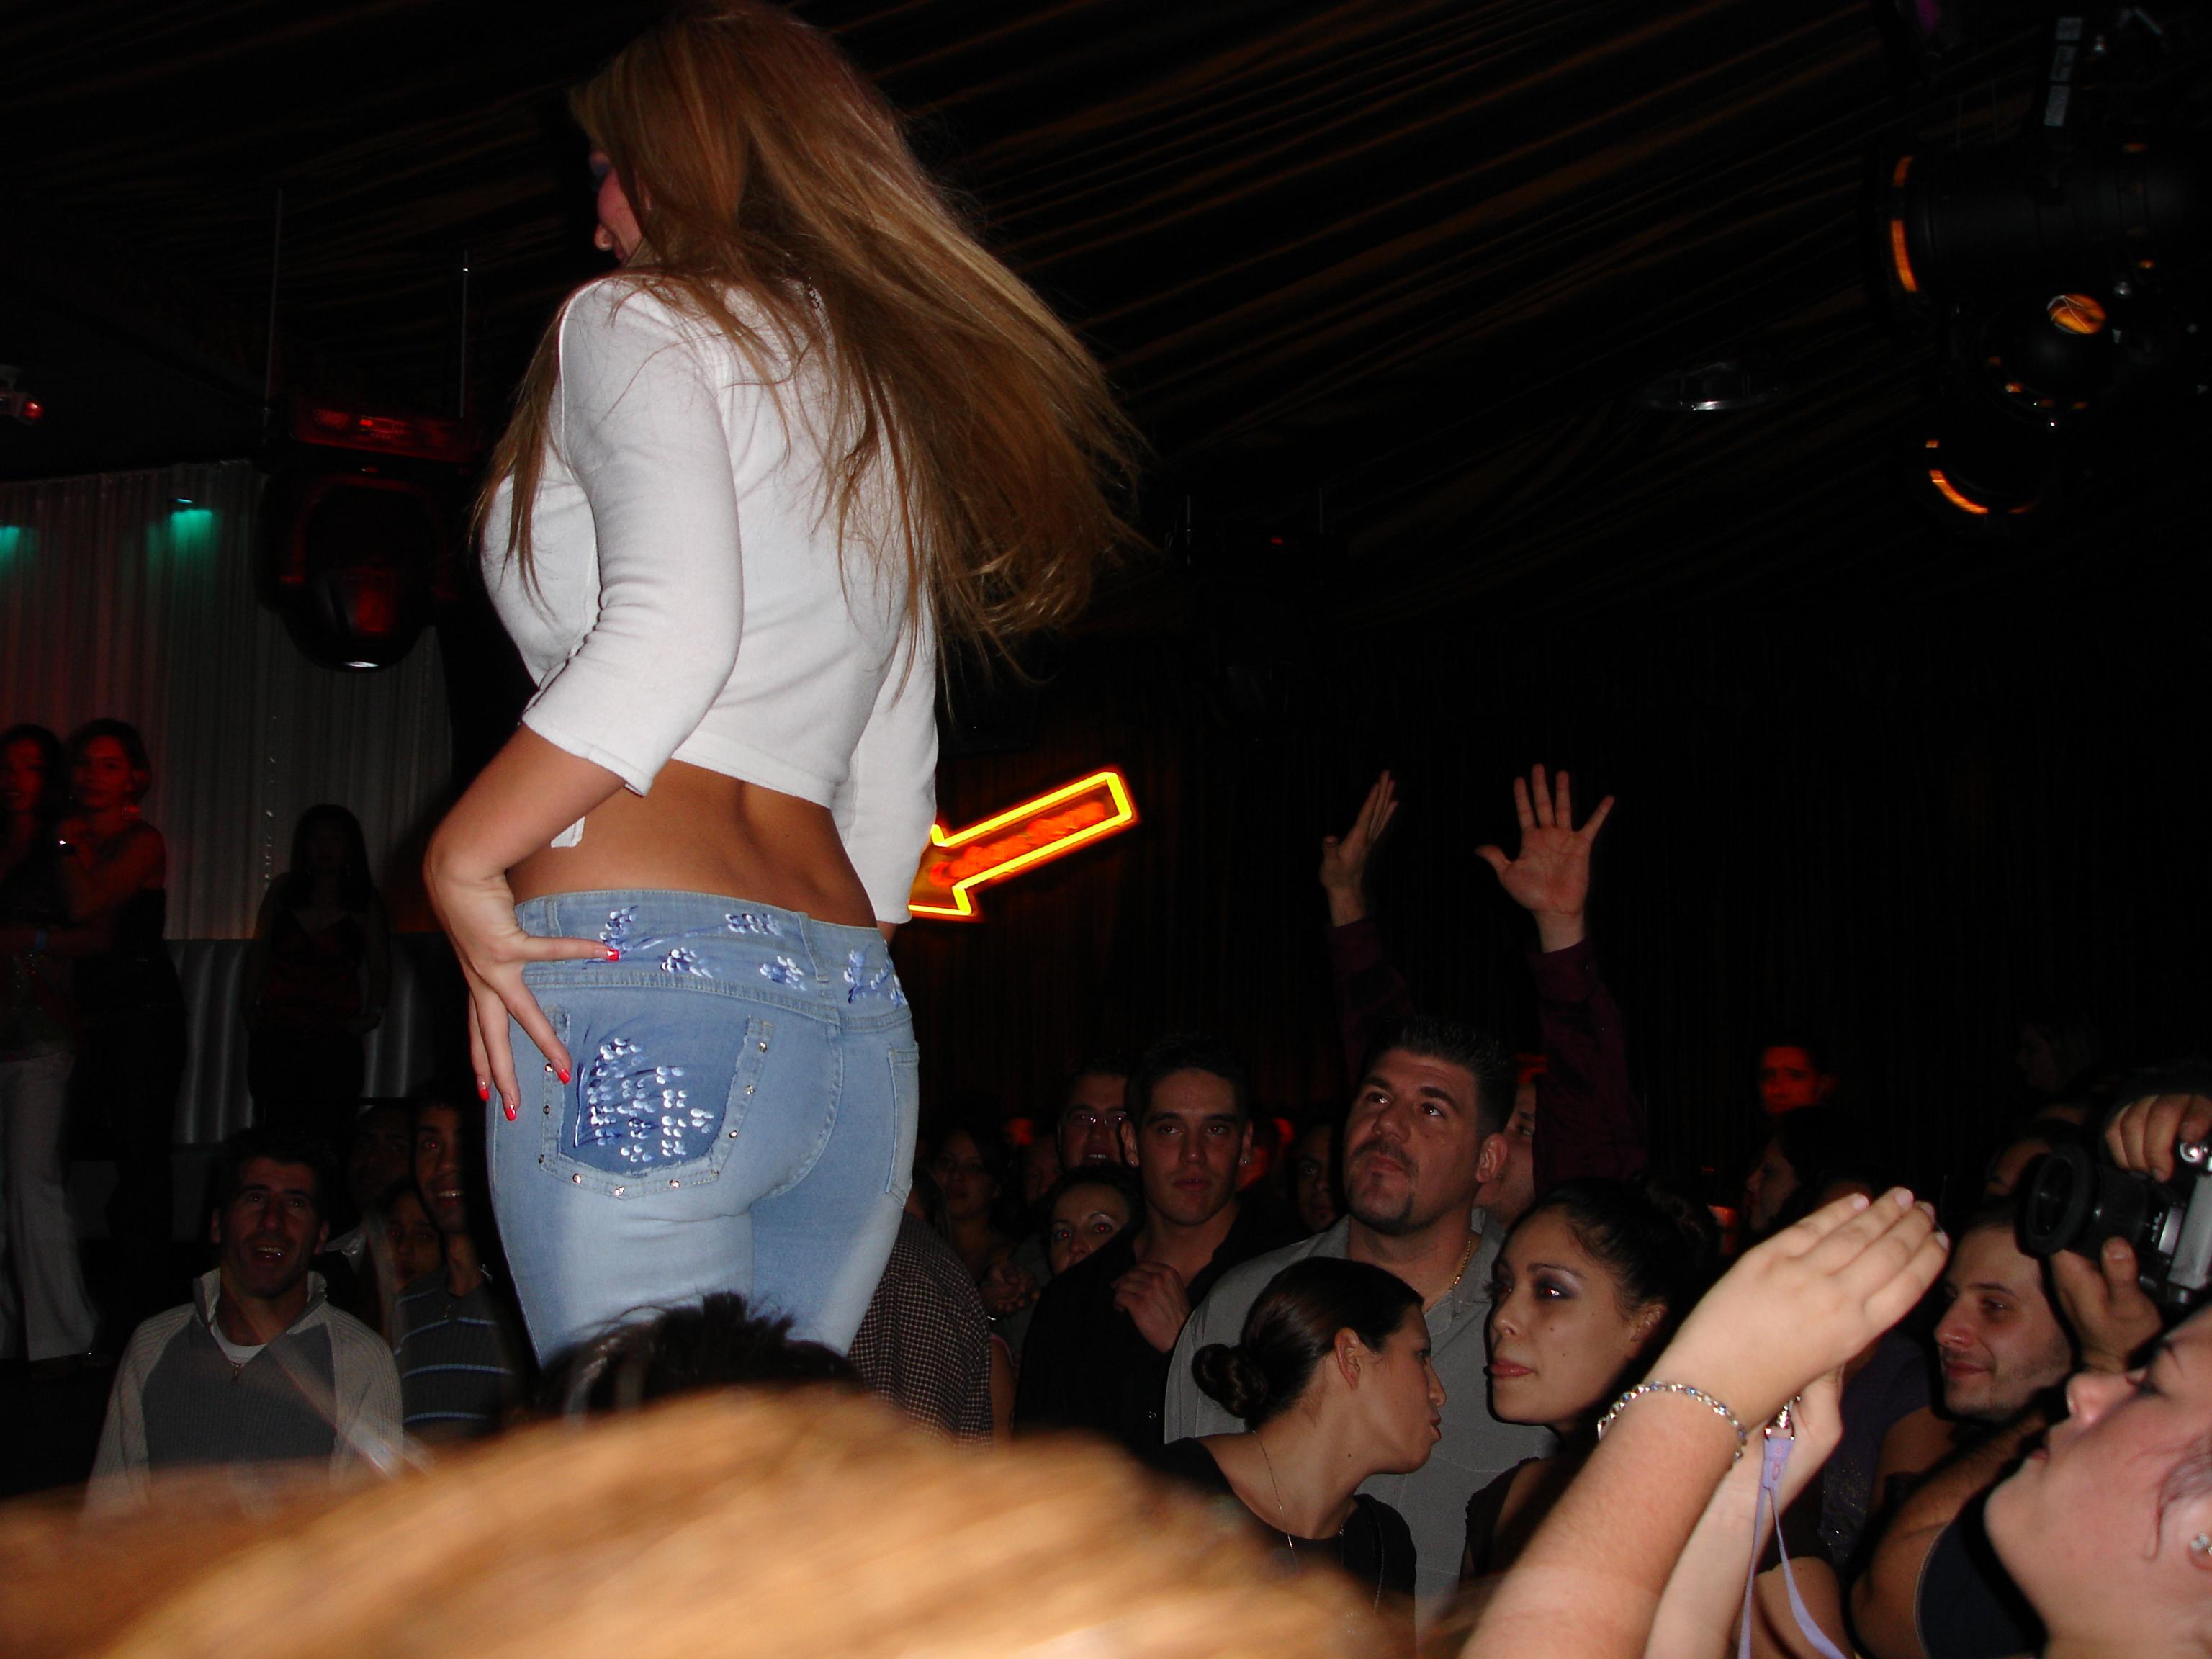 Datoteka:Teen in crop top with tight jeans.jpg